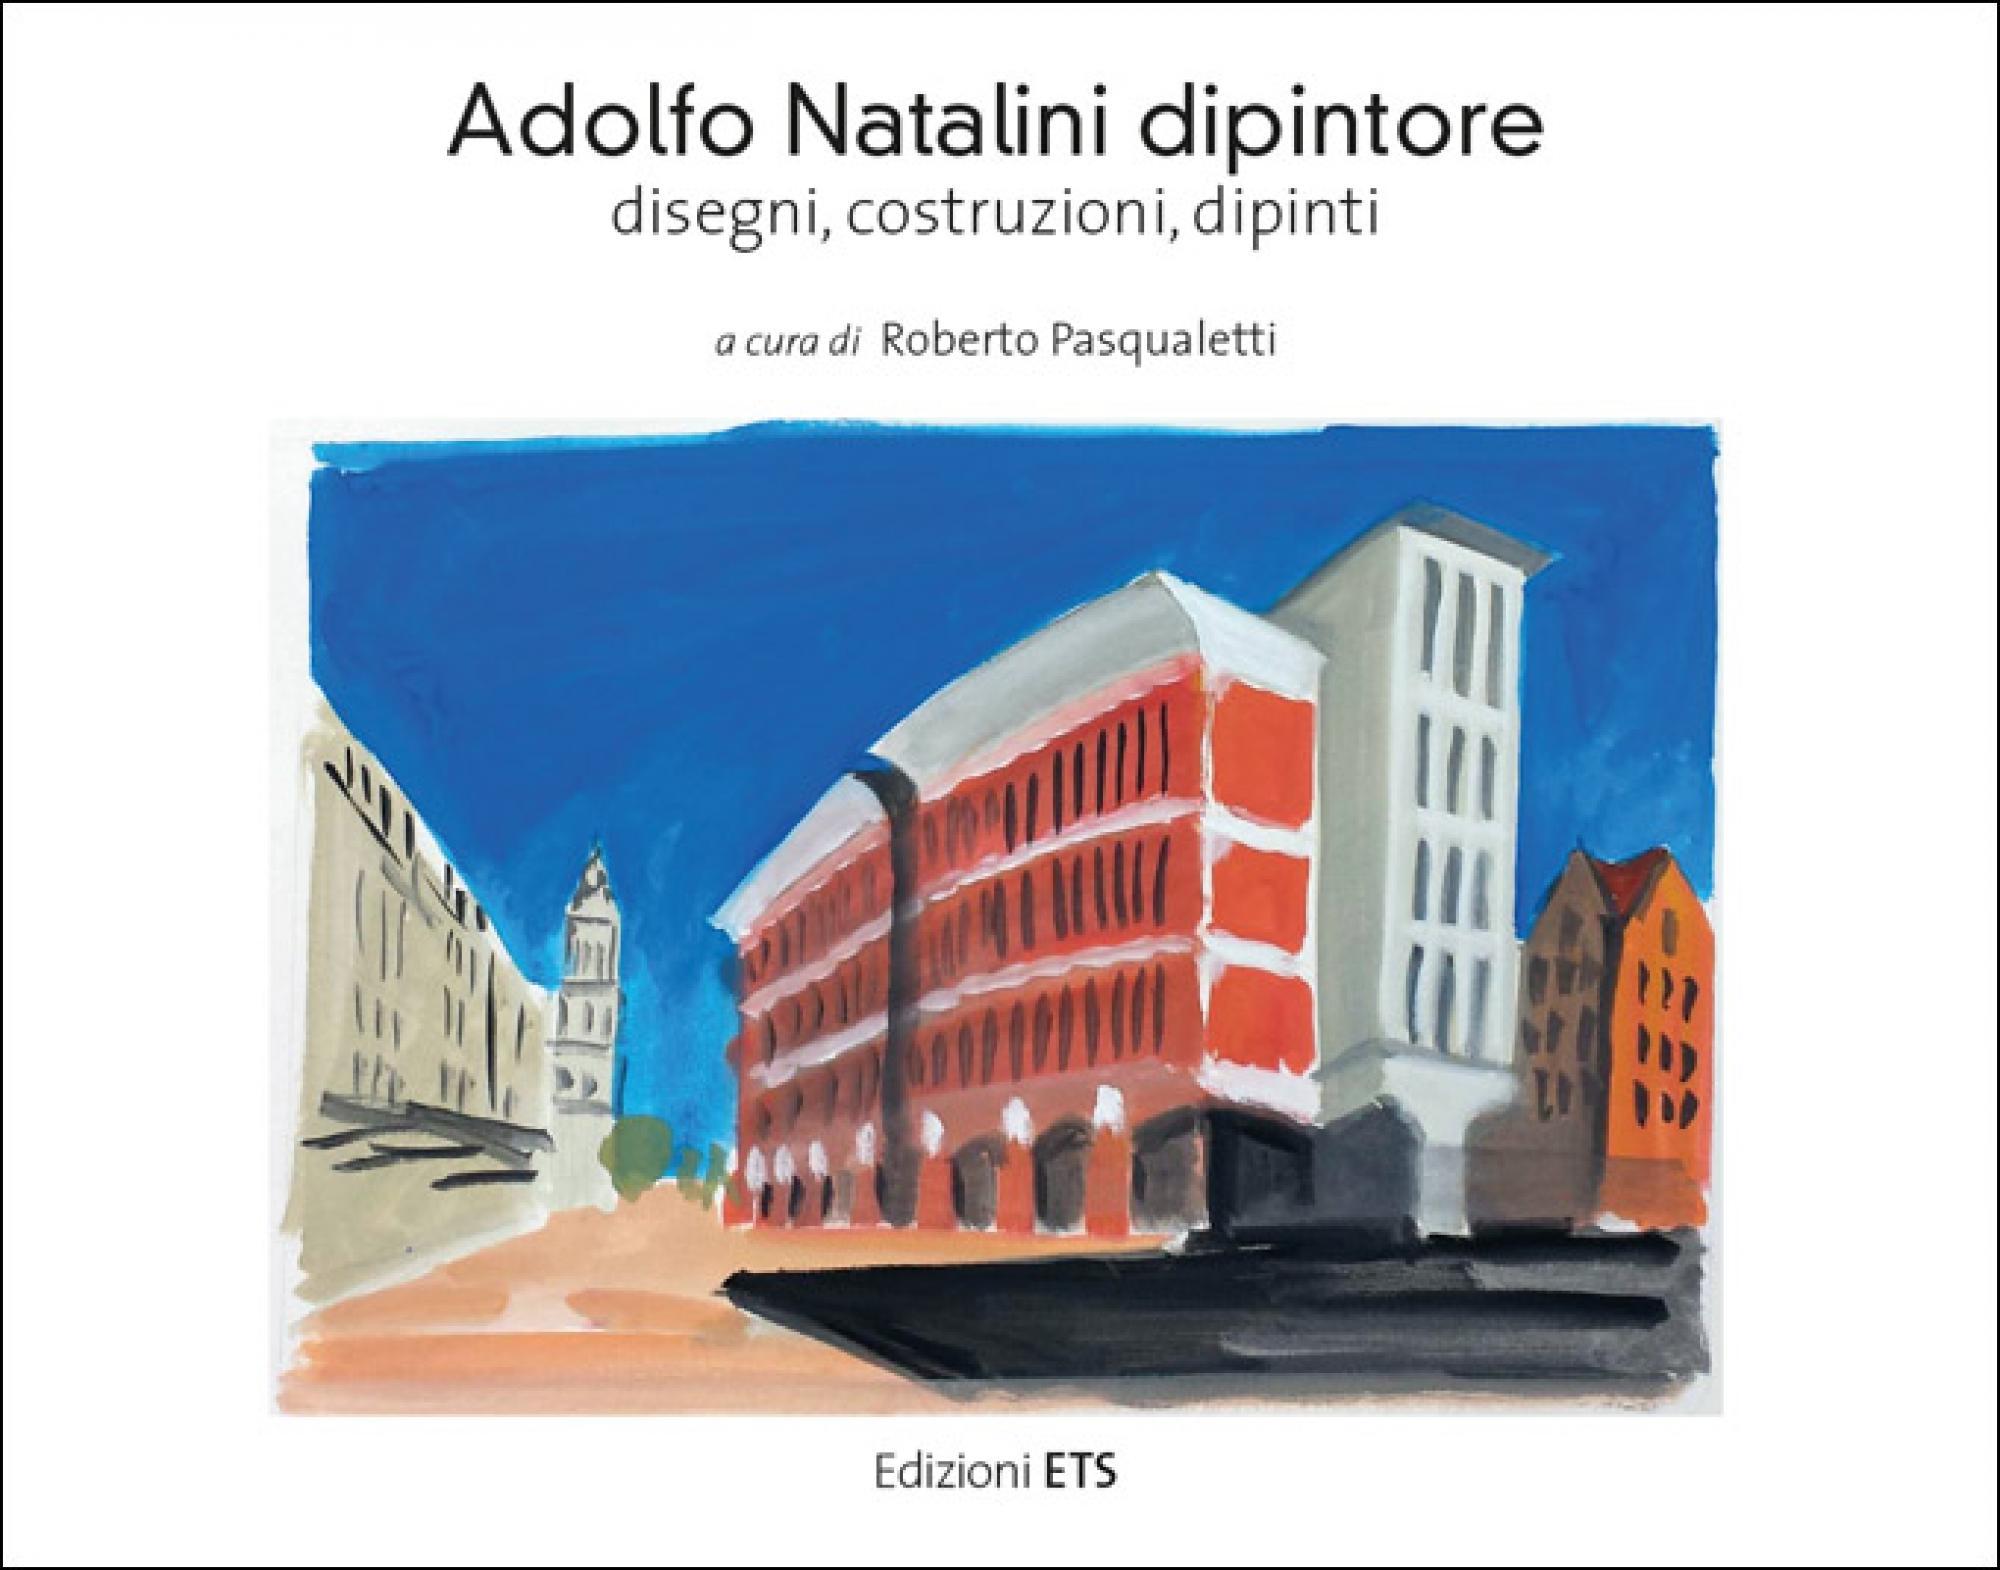 Adolfo Natalini dipintore.disegni, costruzioni, dipinti